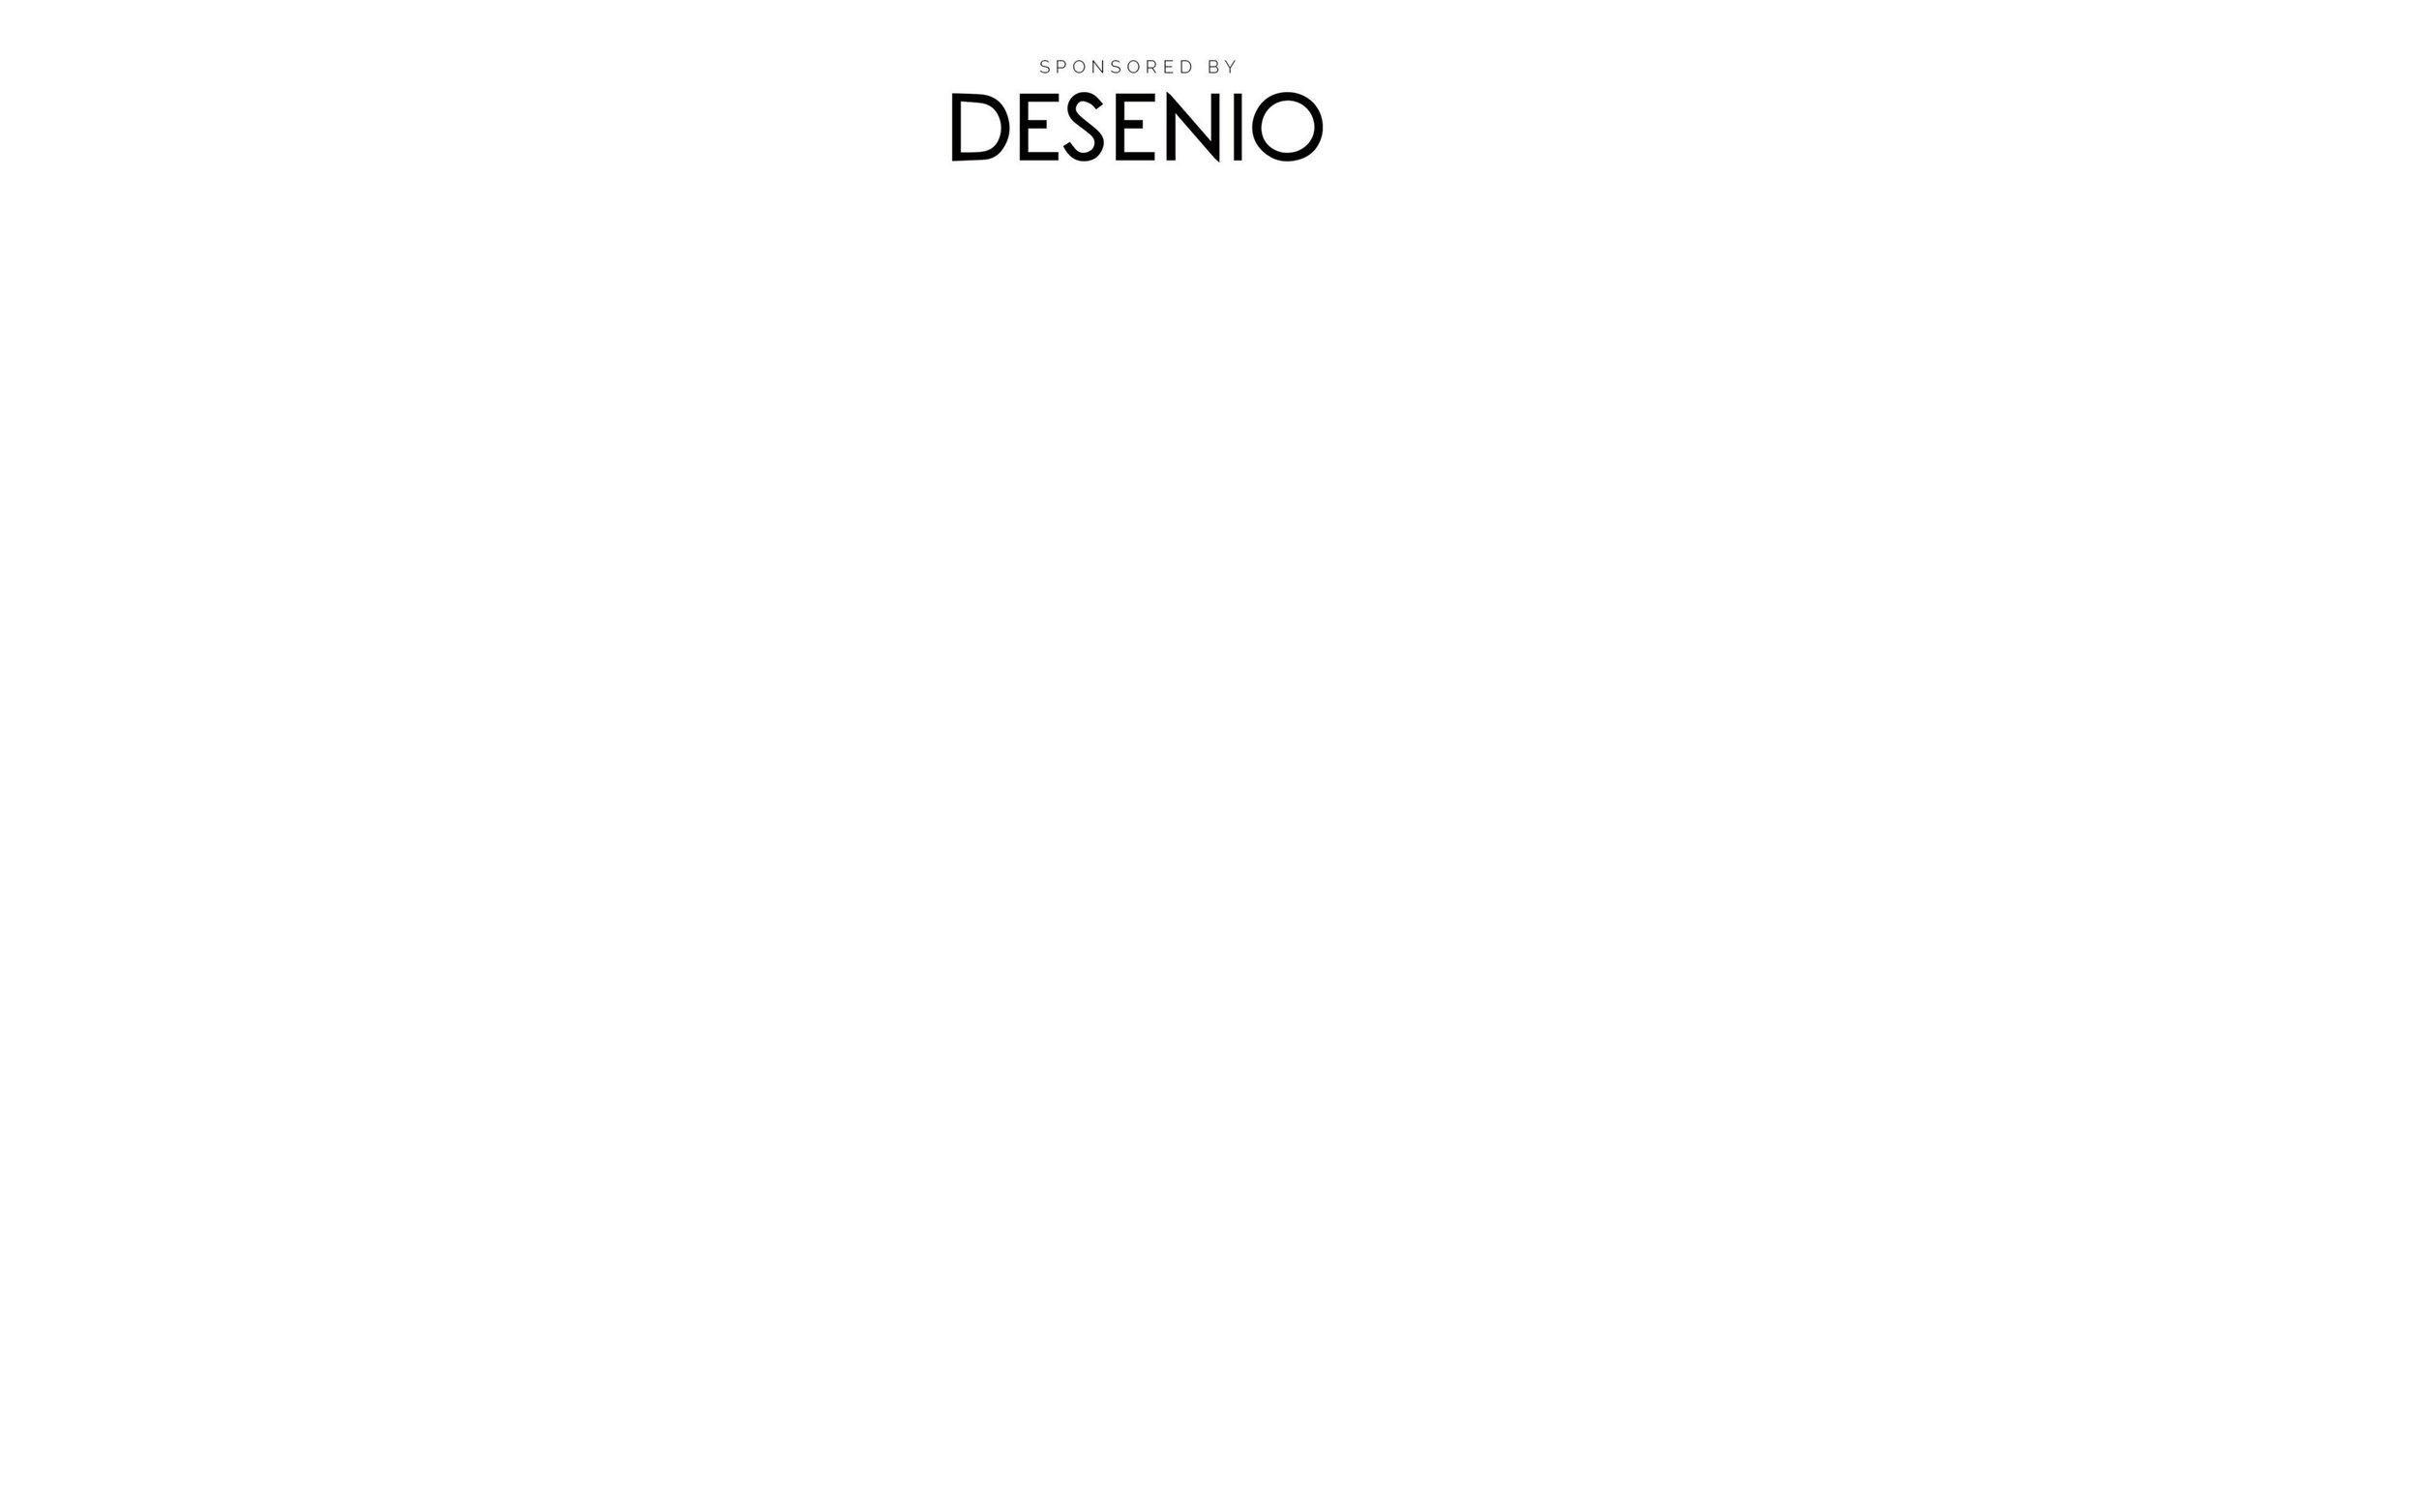 DESENIO.jpg